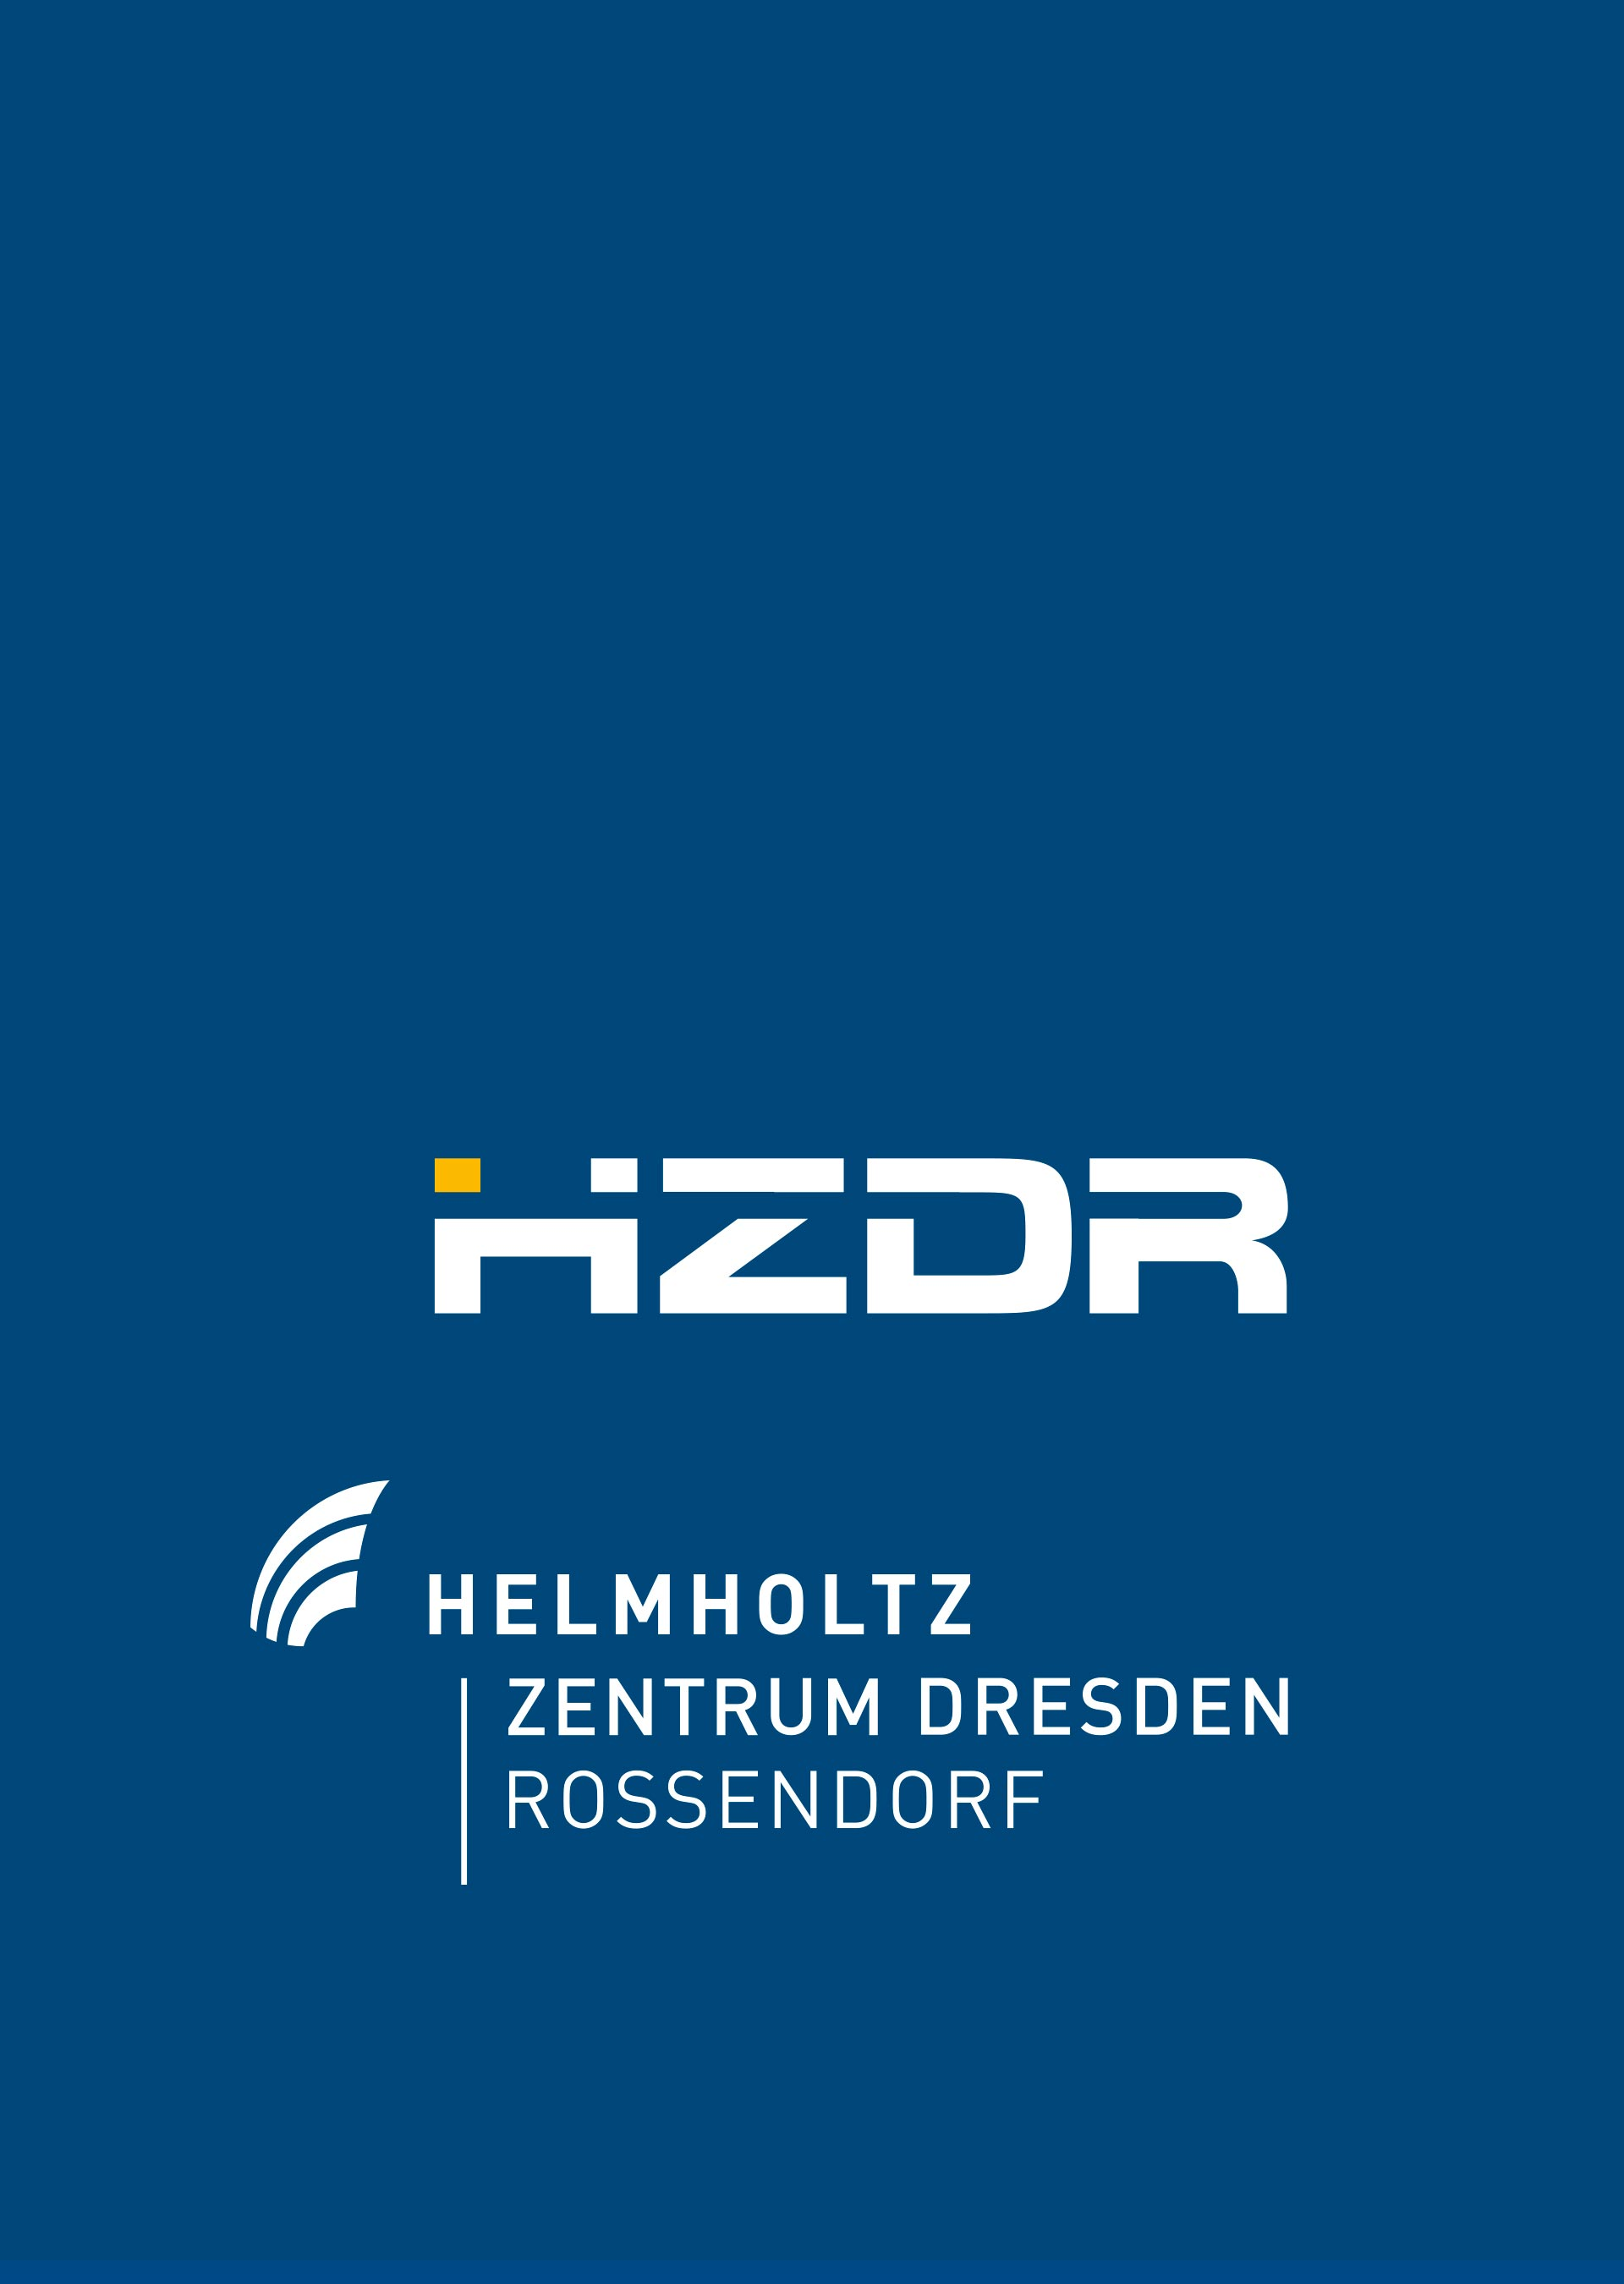 Logo des Helmholz-Zentrum Dresden-Rossendorf